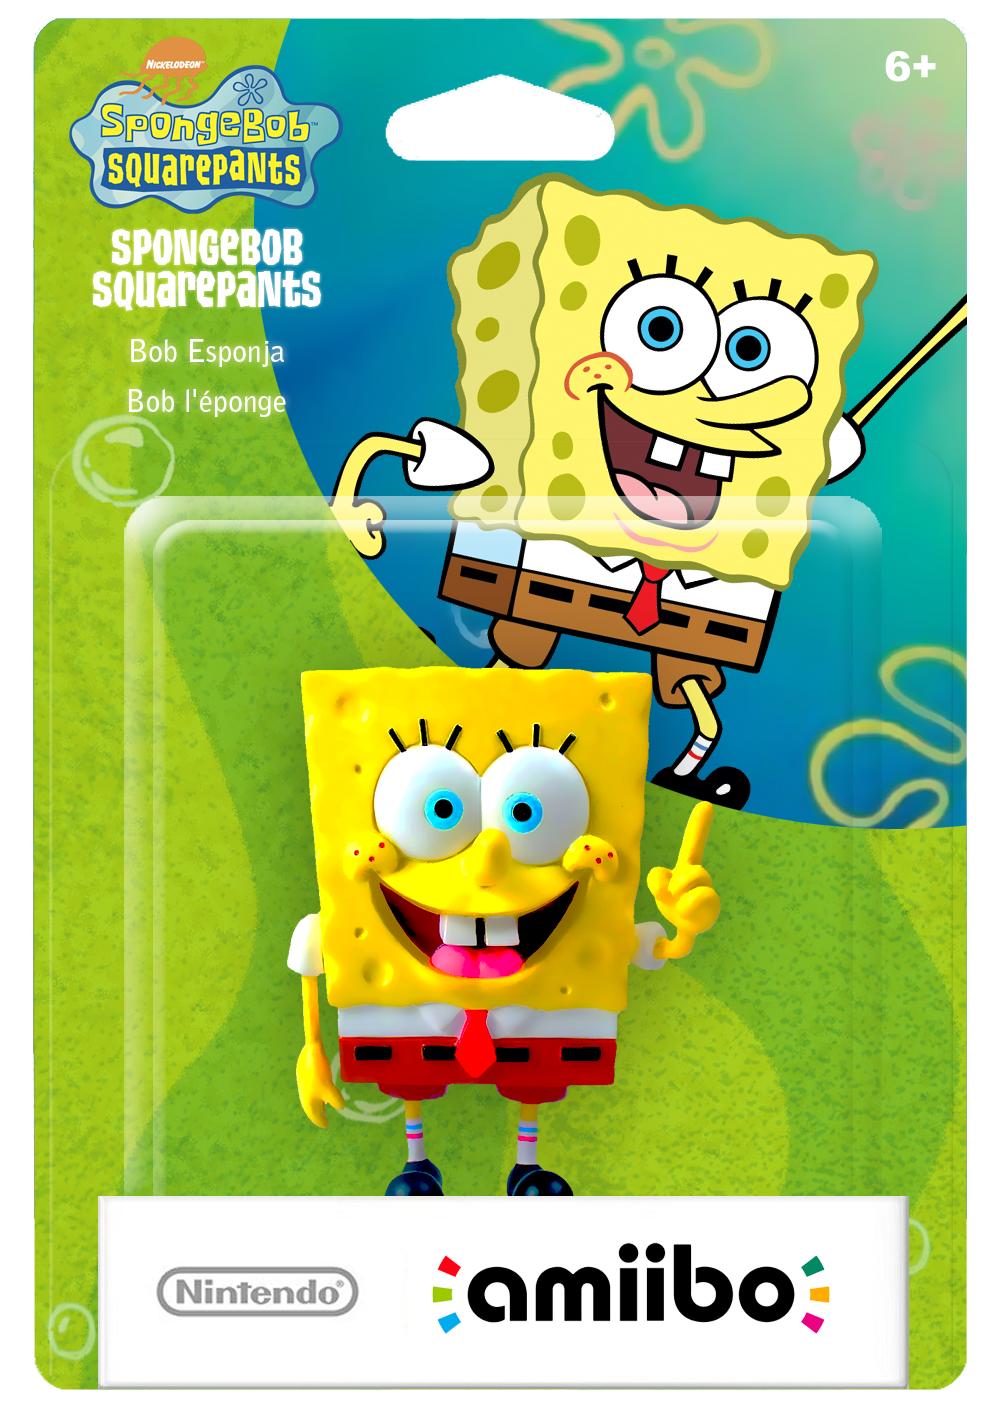 6 nickelodeon spongebob squarepants spongebob squarepants bob esponja bob léponge nintendo